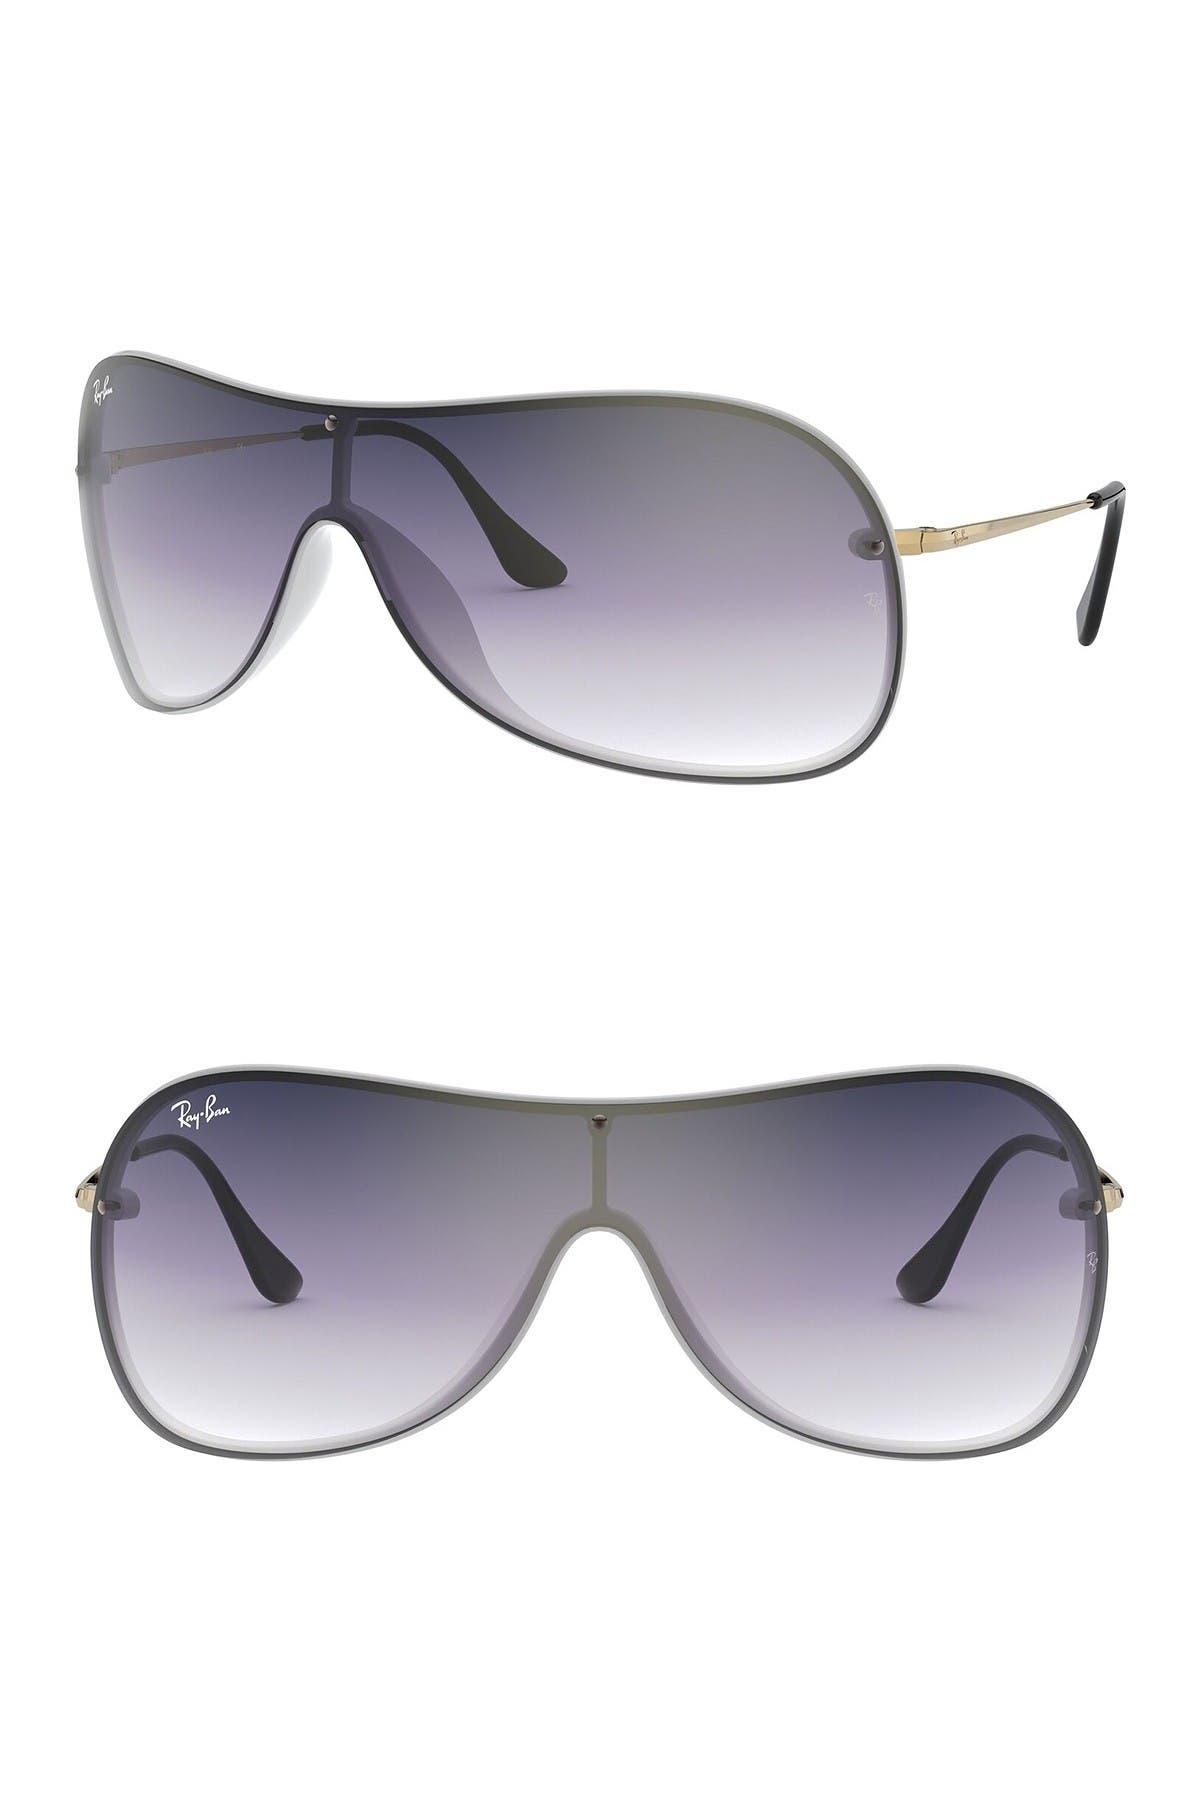 Image of Ray-Ban 141mm Gradient Shield Sunglasses